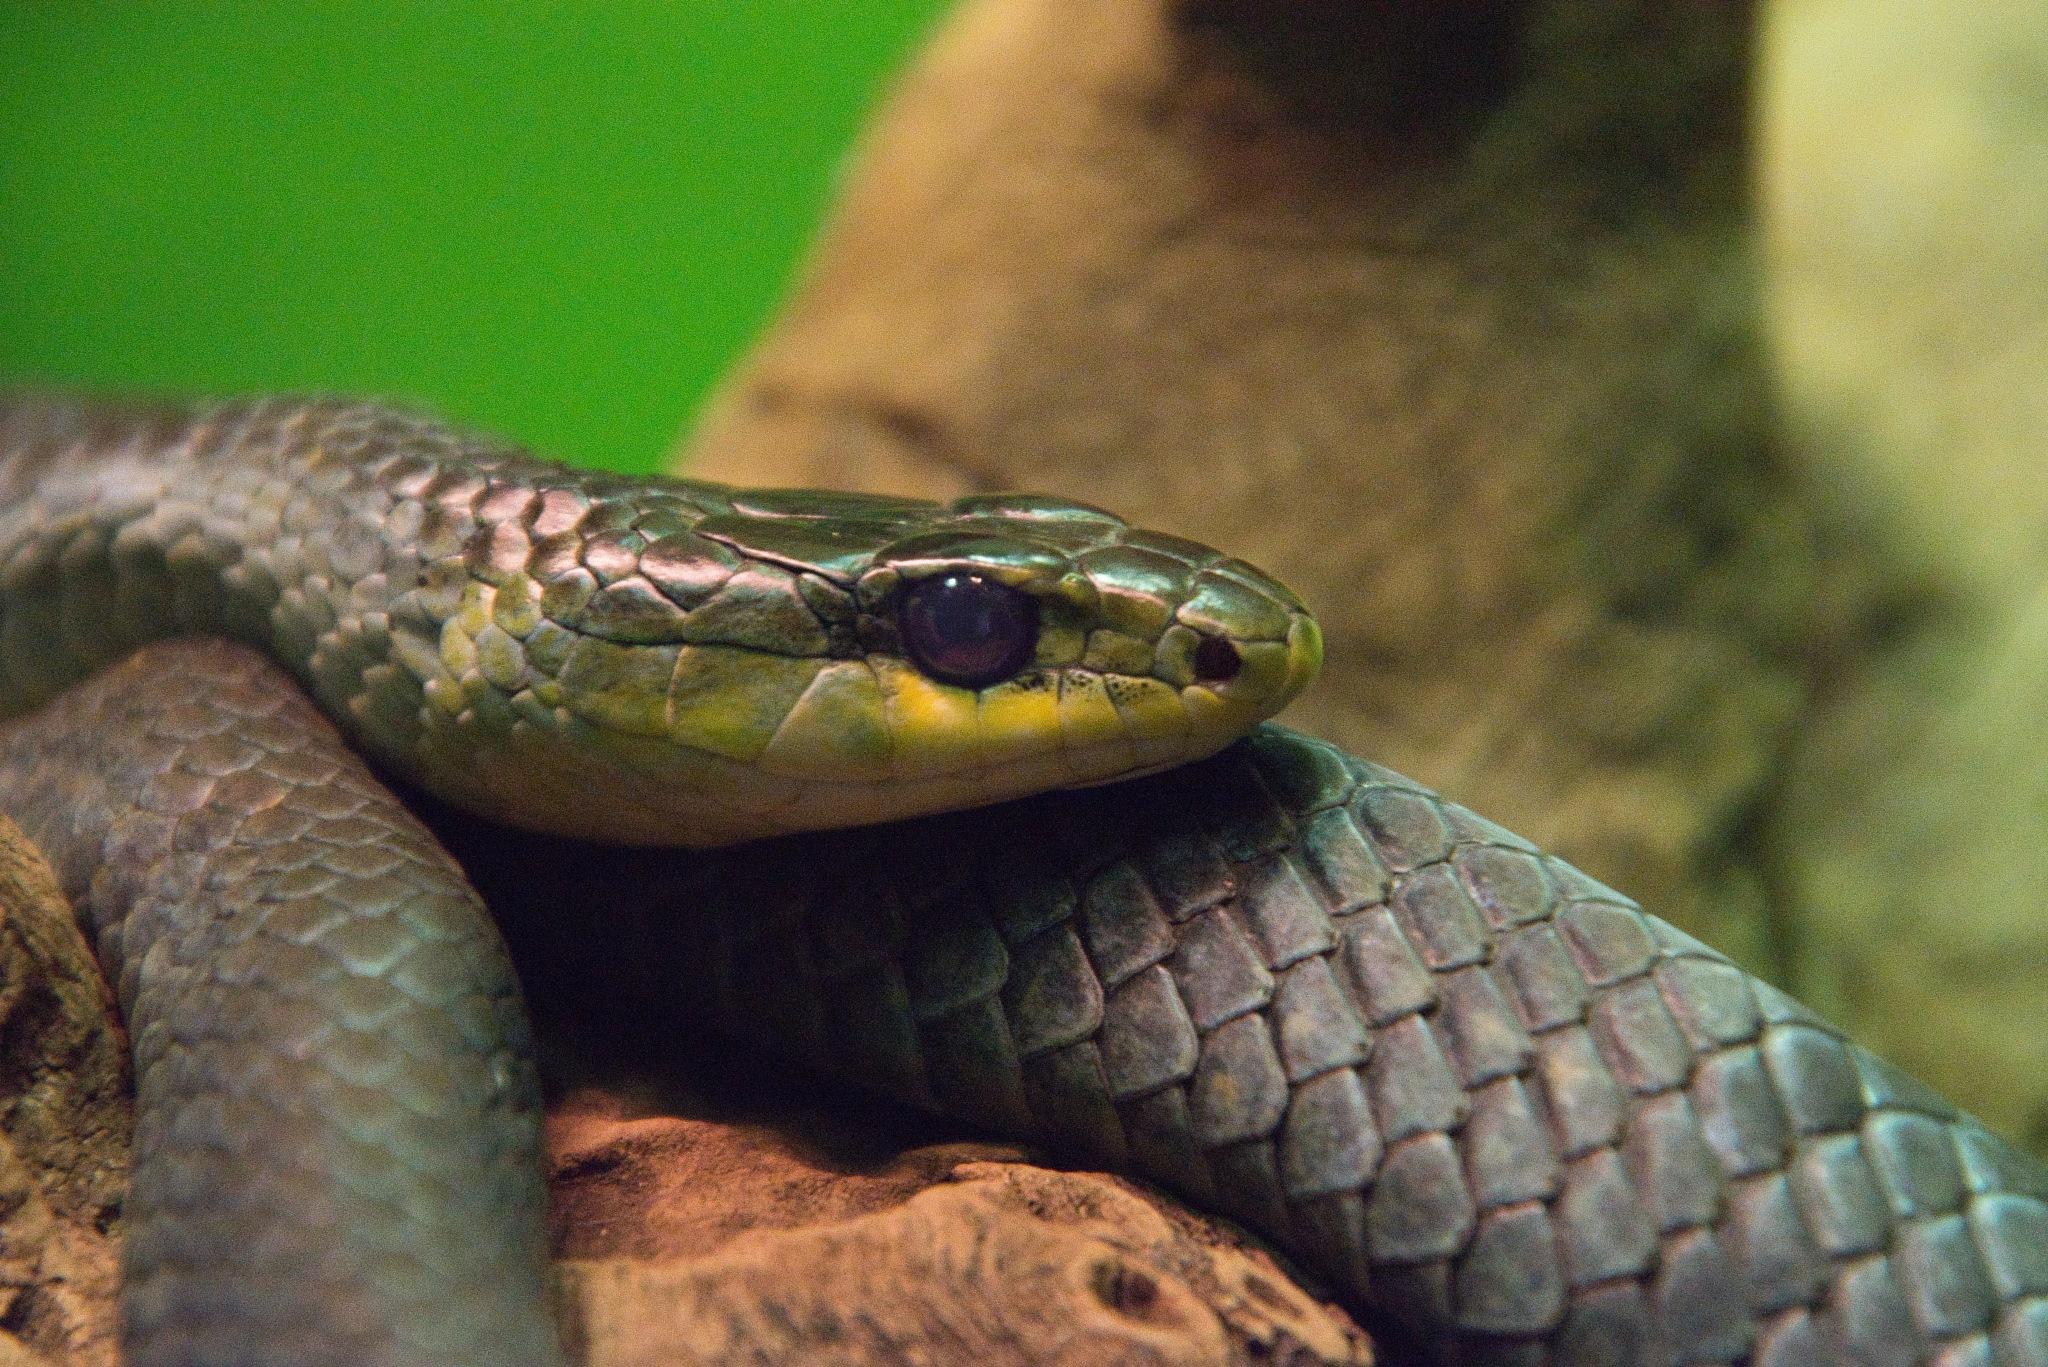 Green Snake by Kim McGlinchey